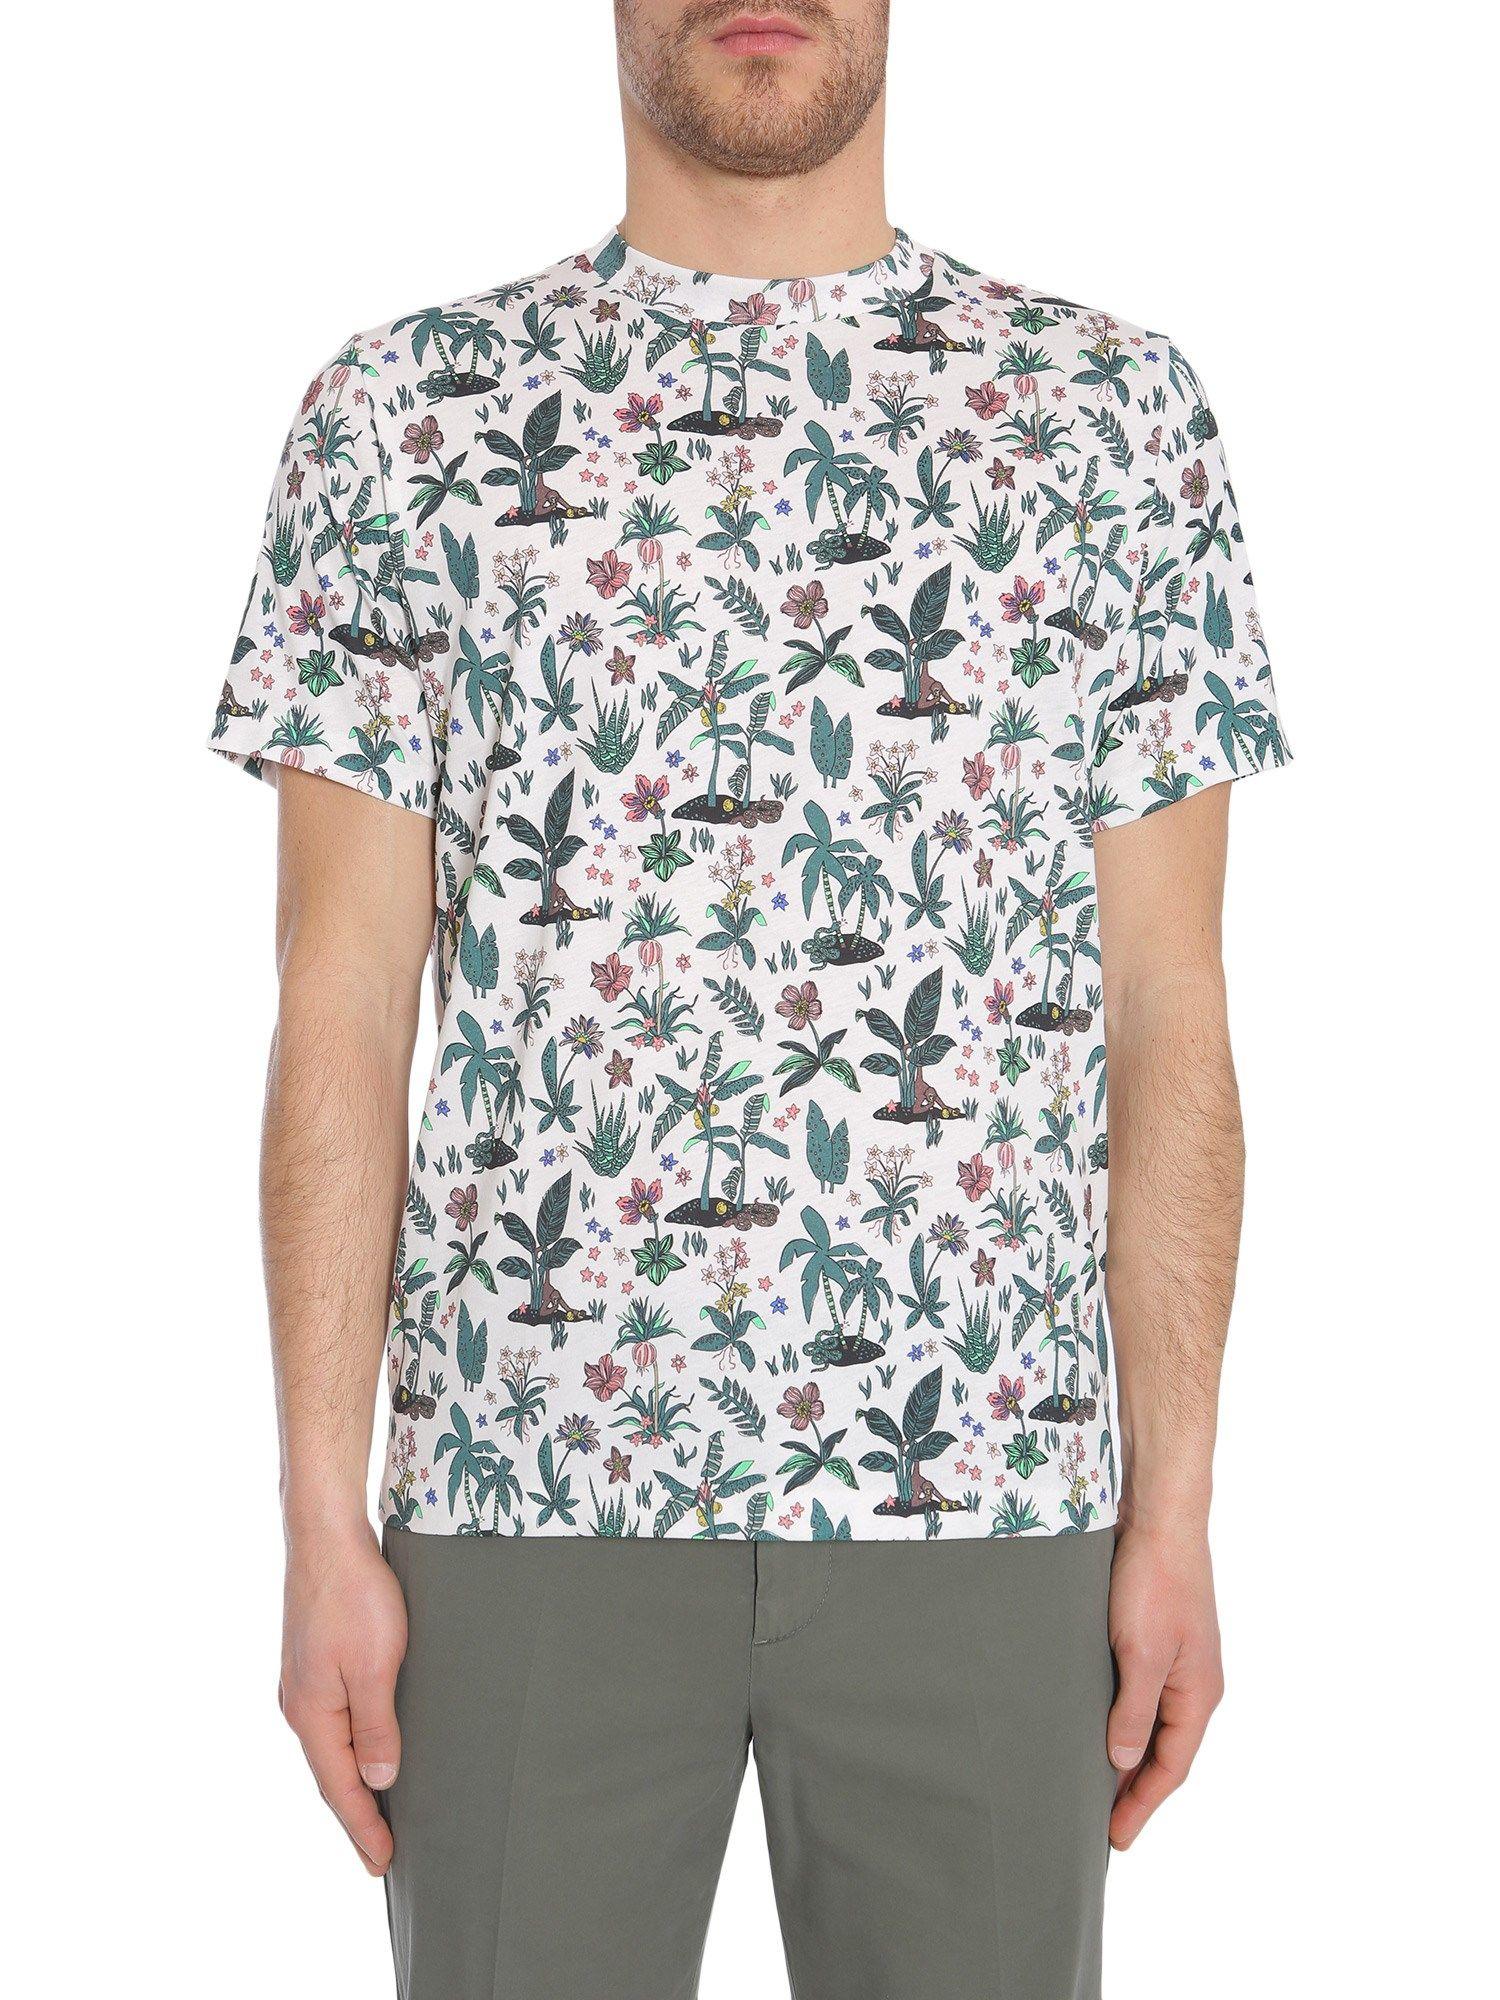 Tropical Floral Print T-shirt